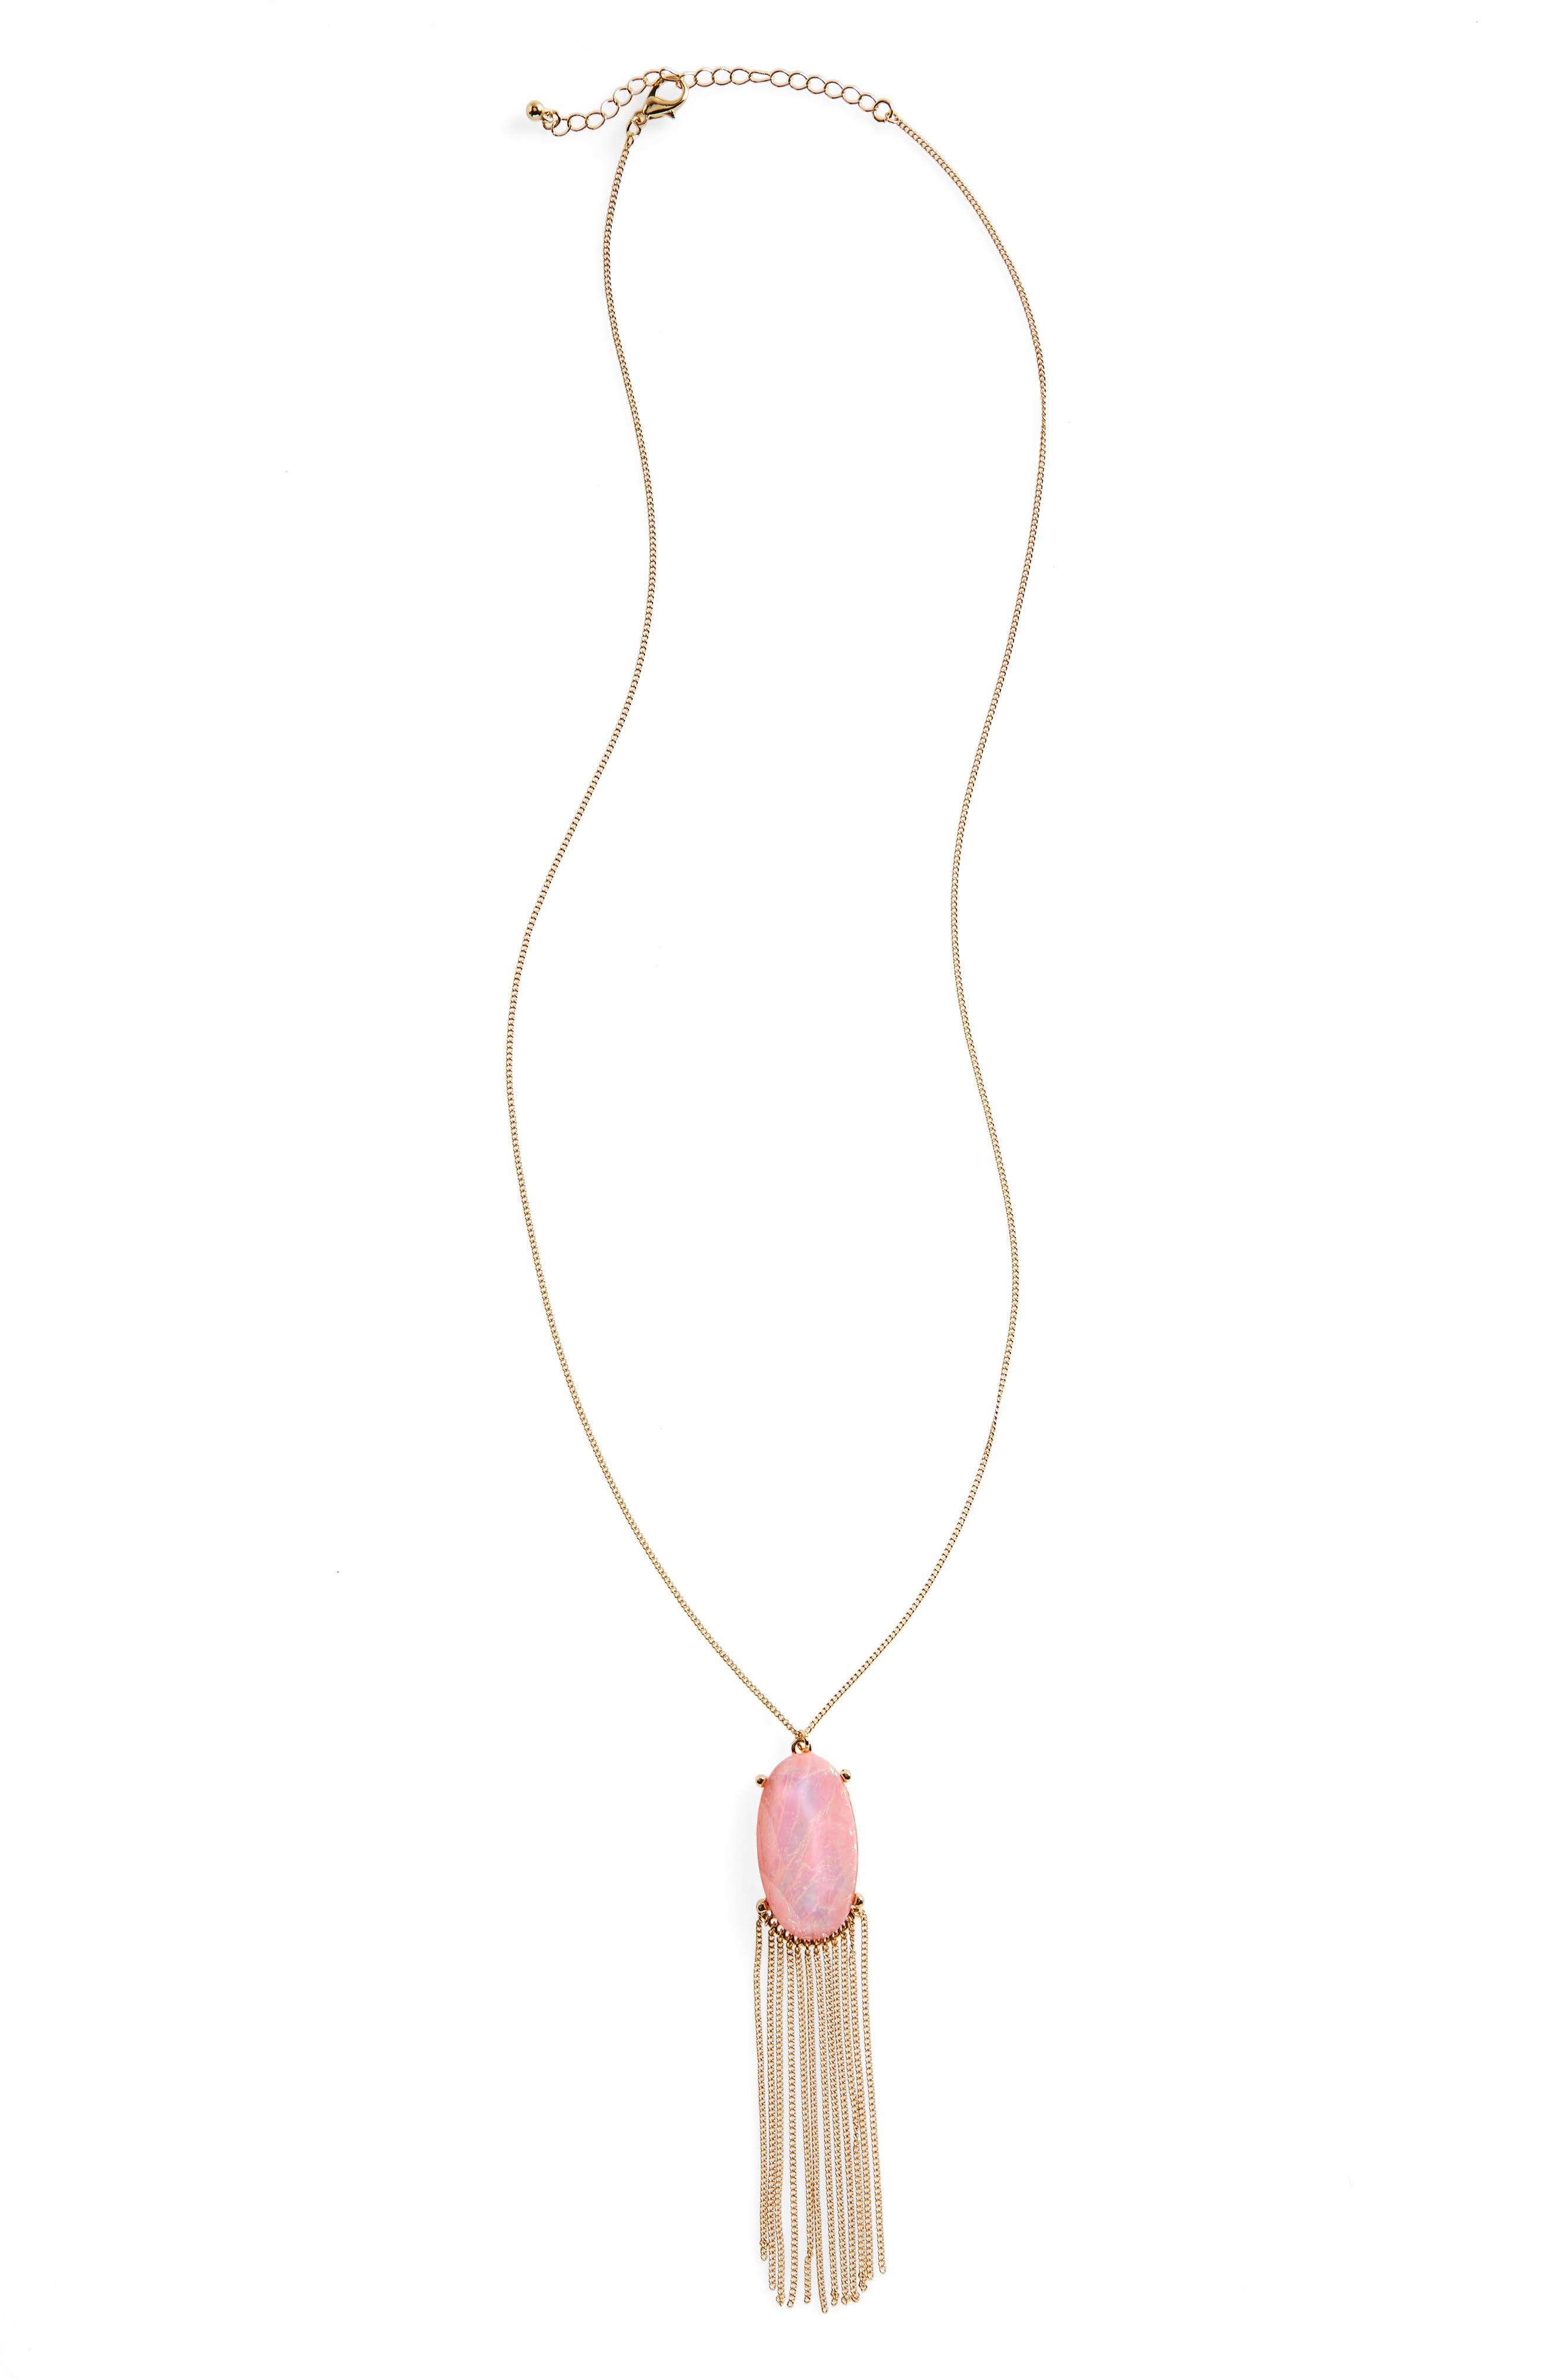 Alternate Image 1 Selected - BP. Stone & Tassel Pendant Necklace